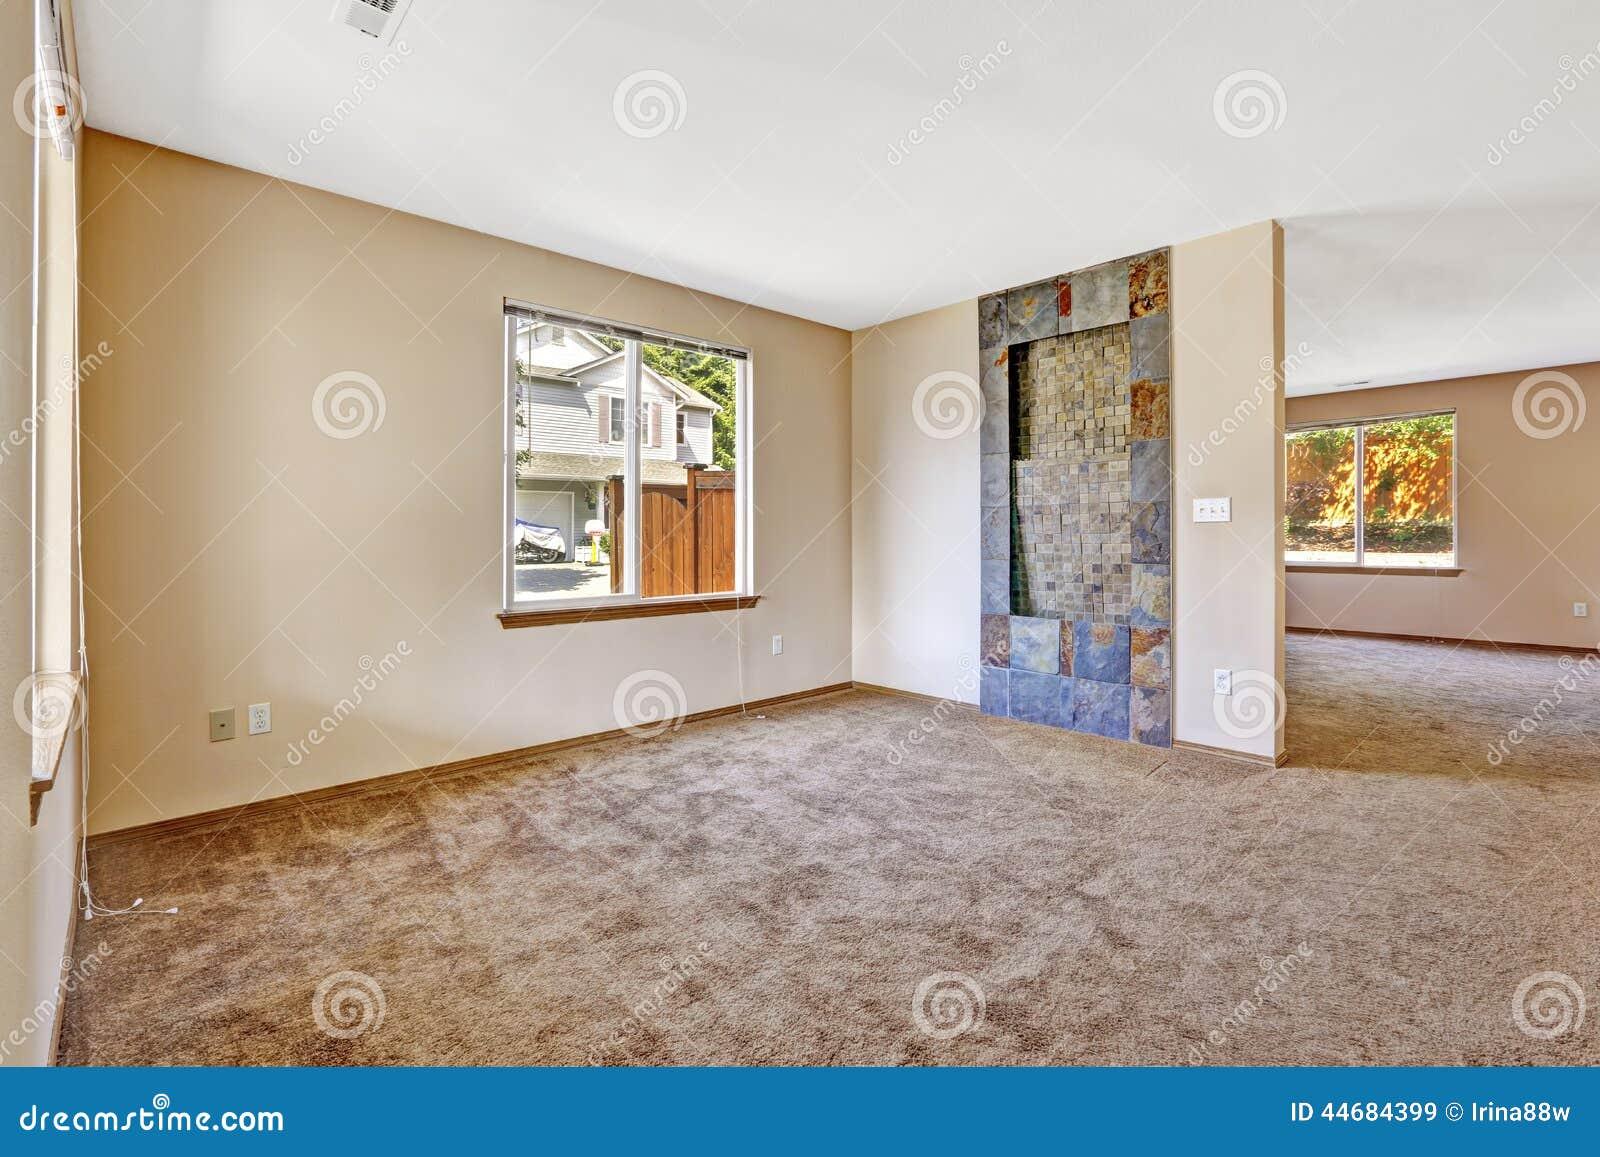 wall design idea for house interior tile trim